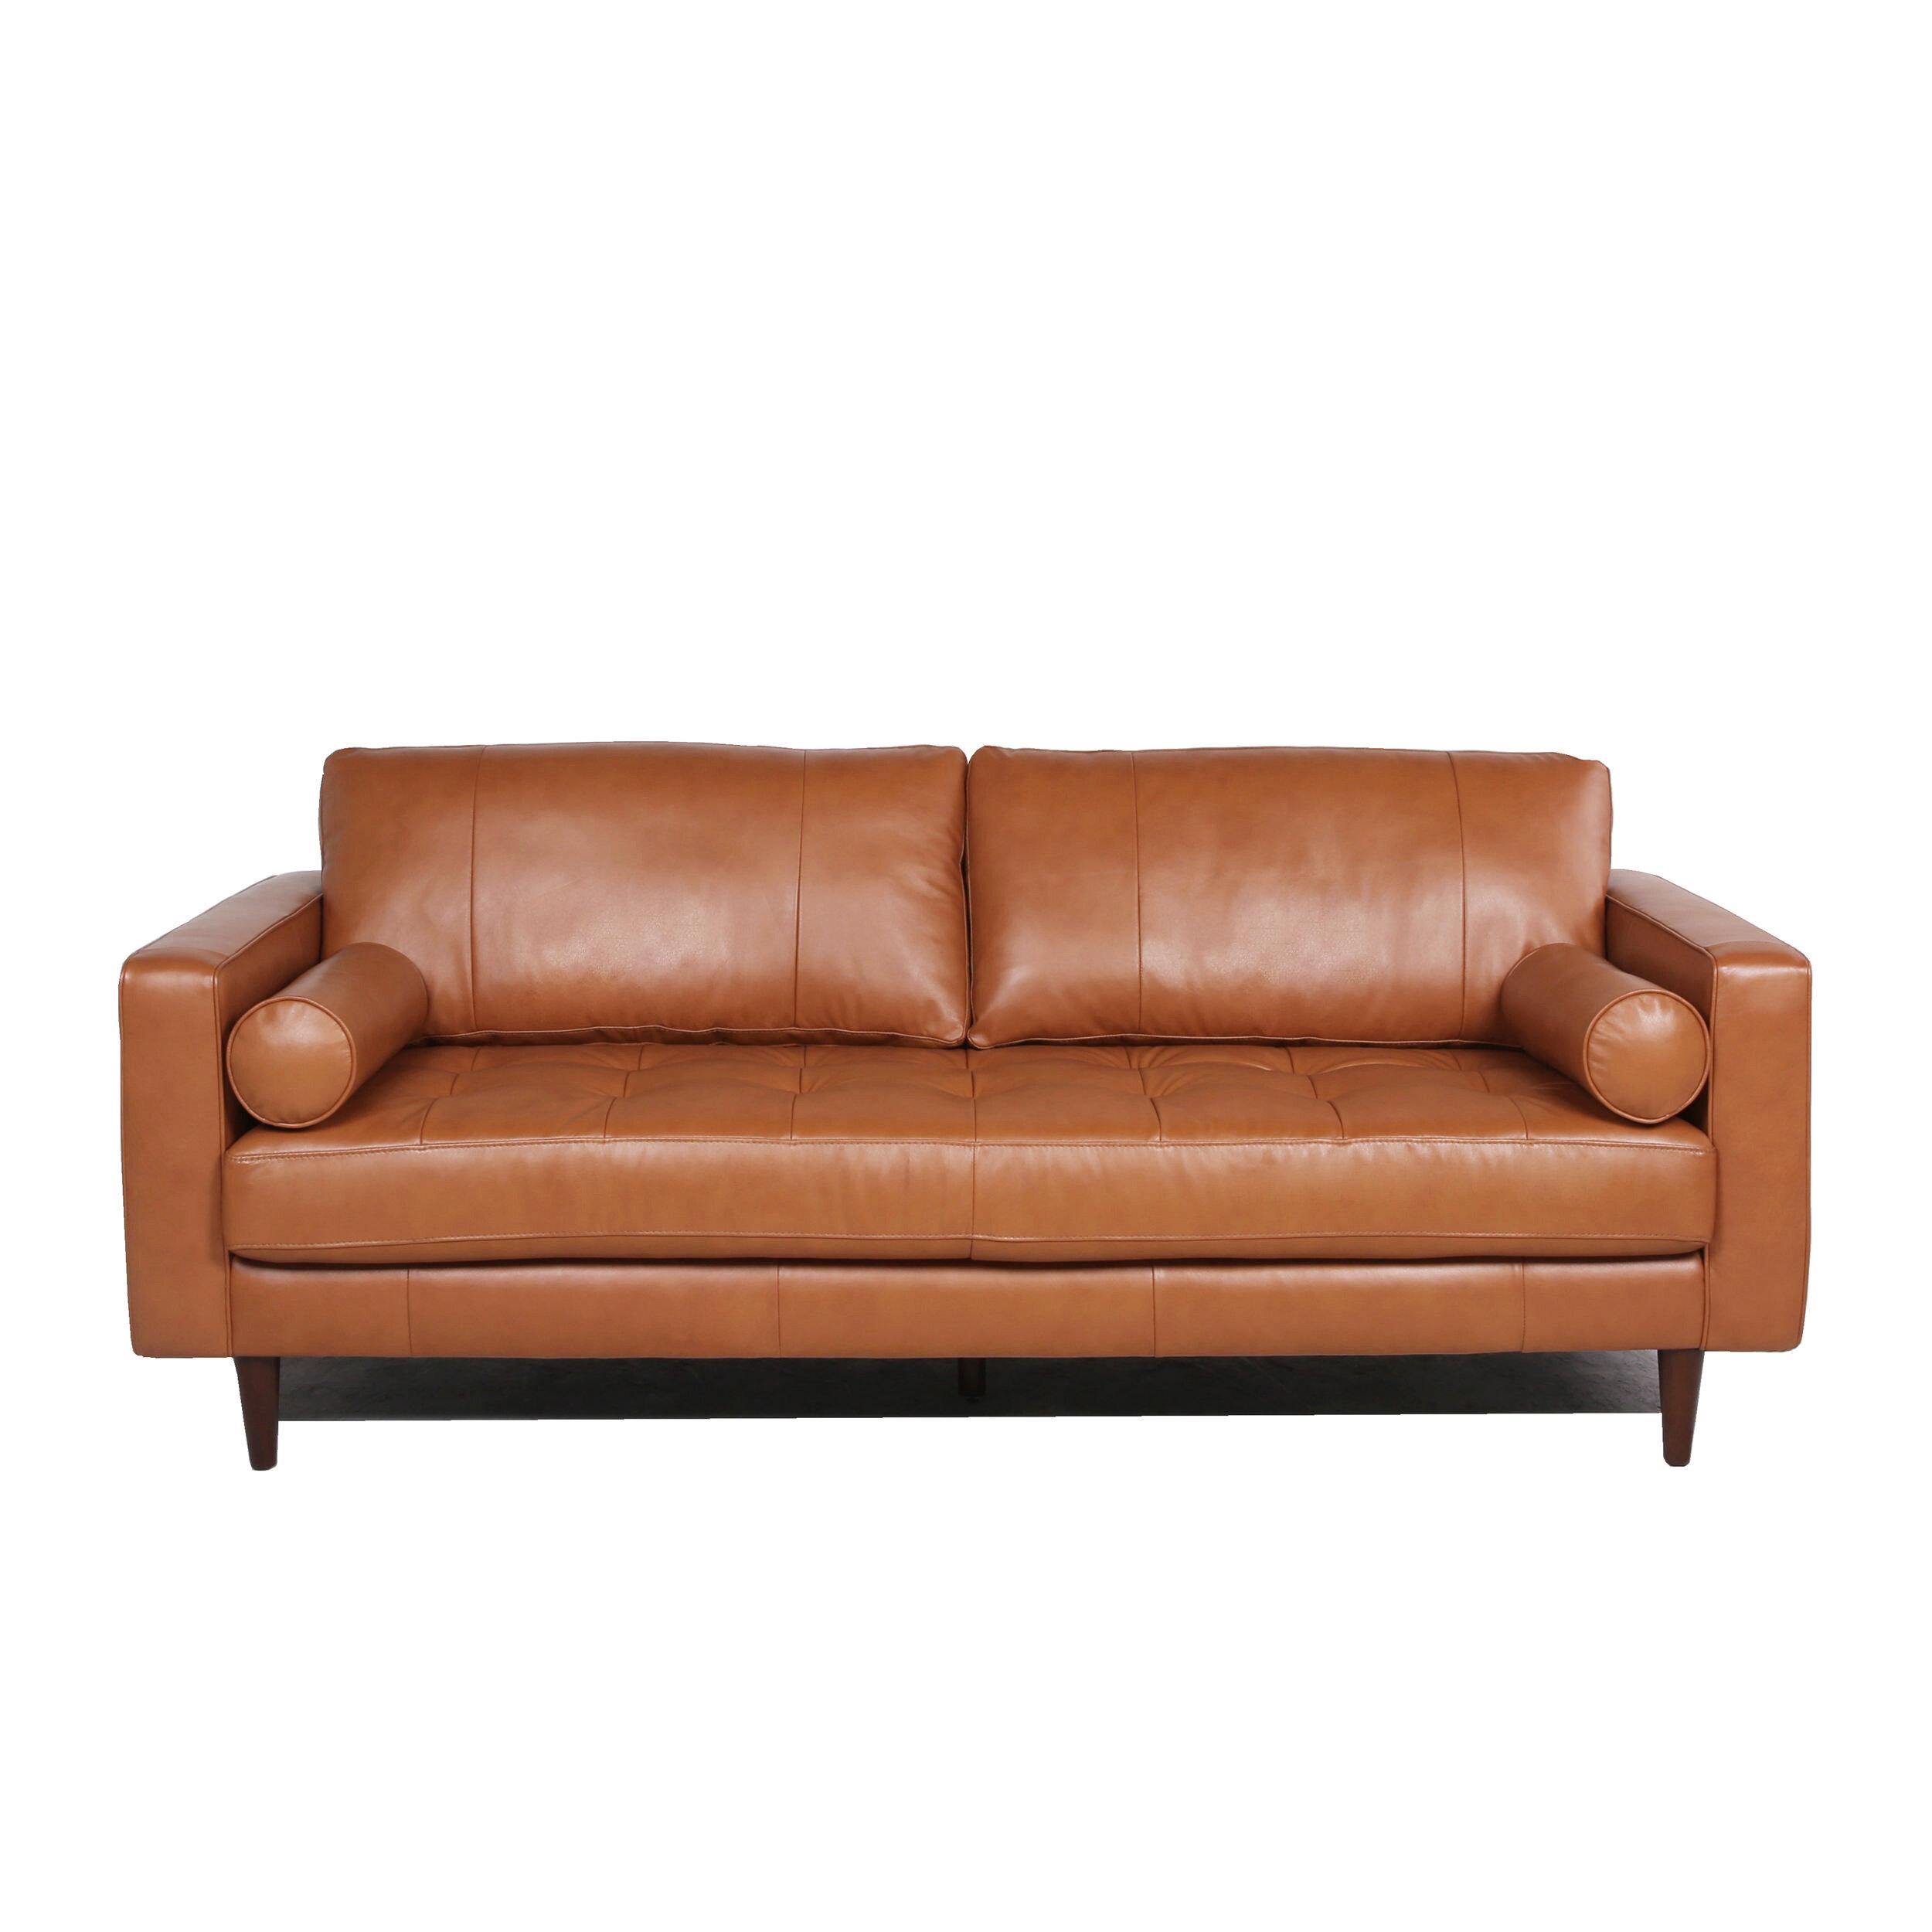 Brayden Studio Bickford Leather Sofa